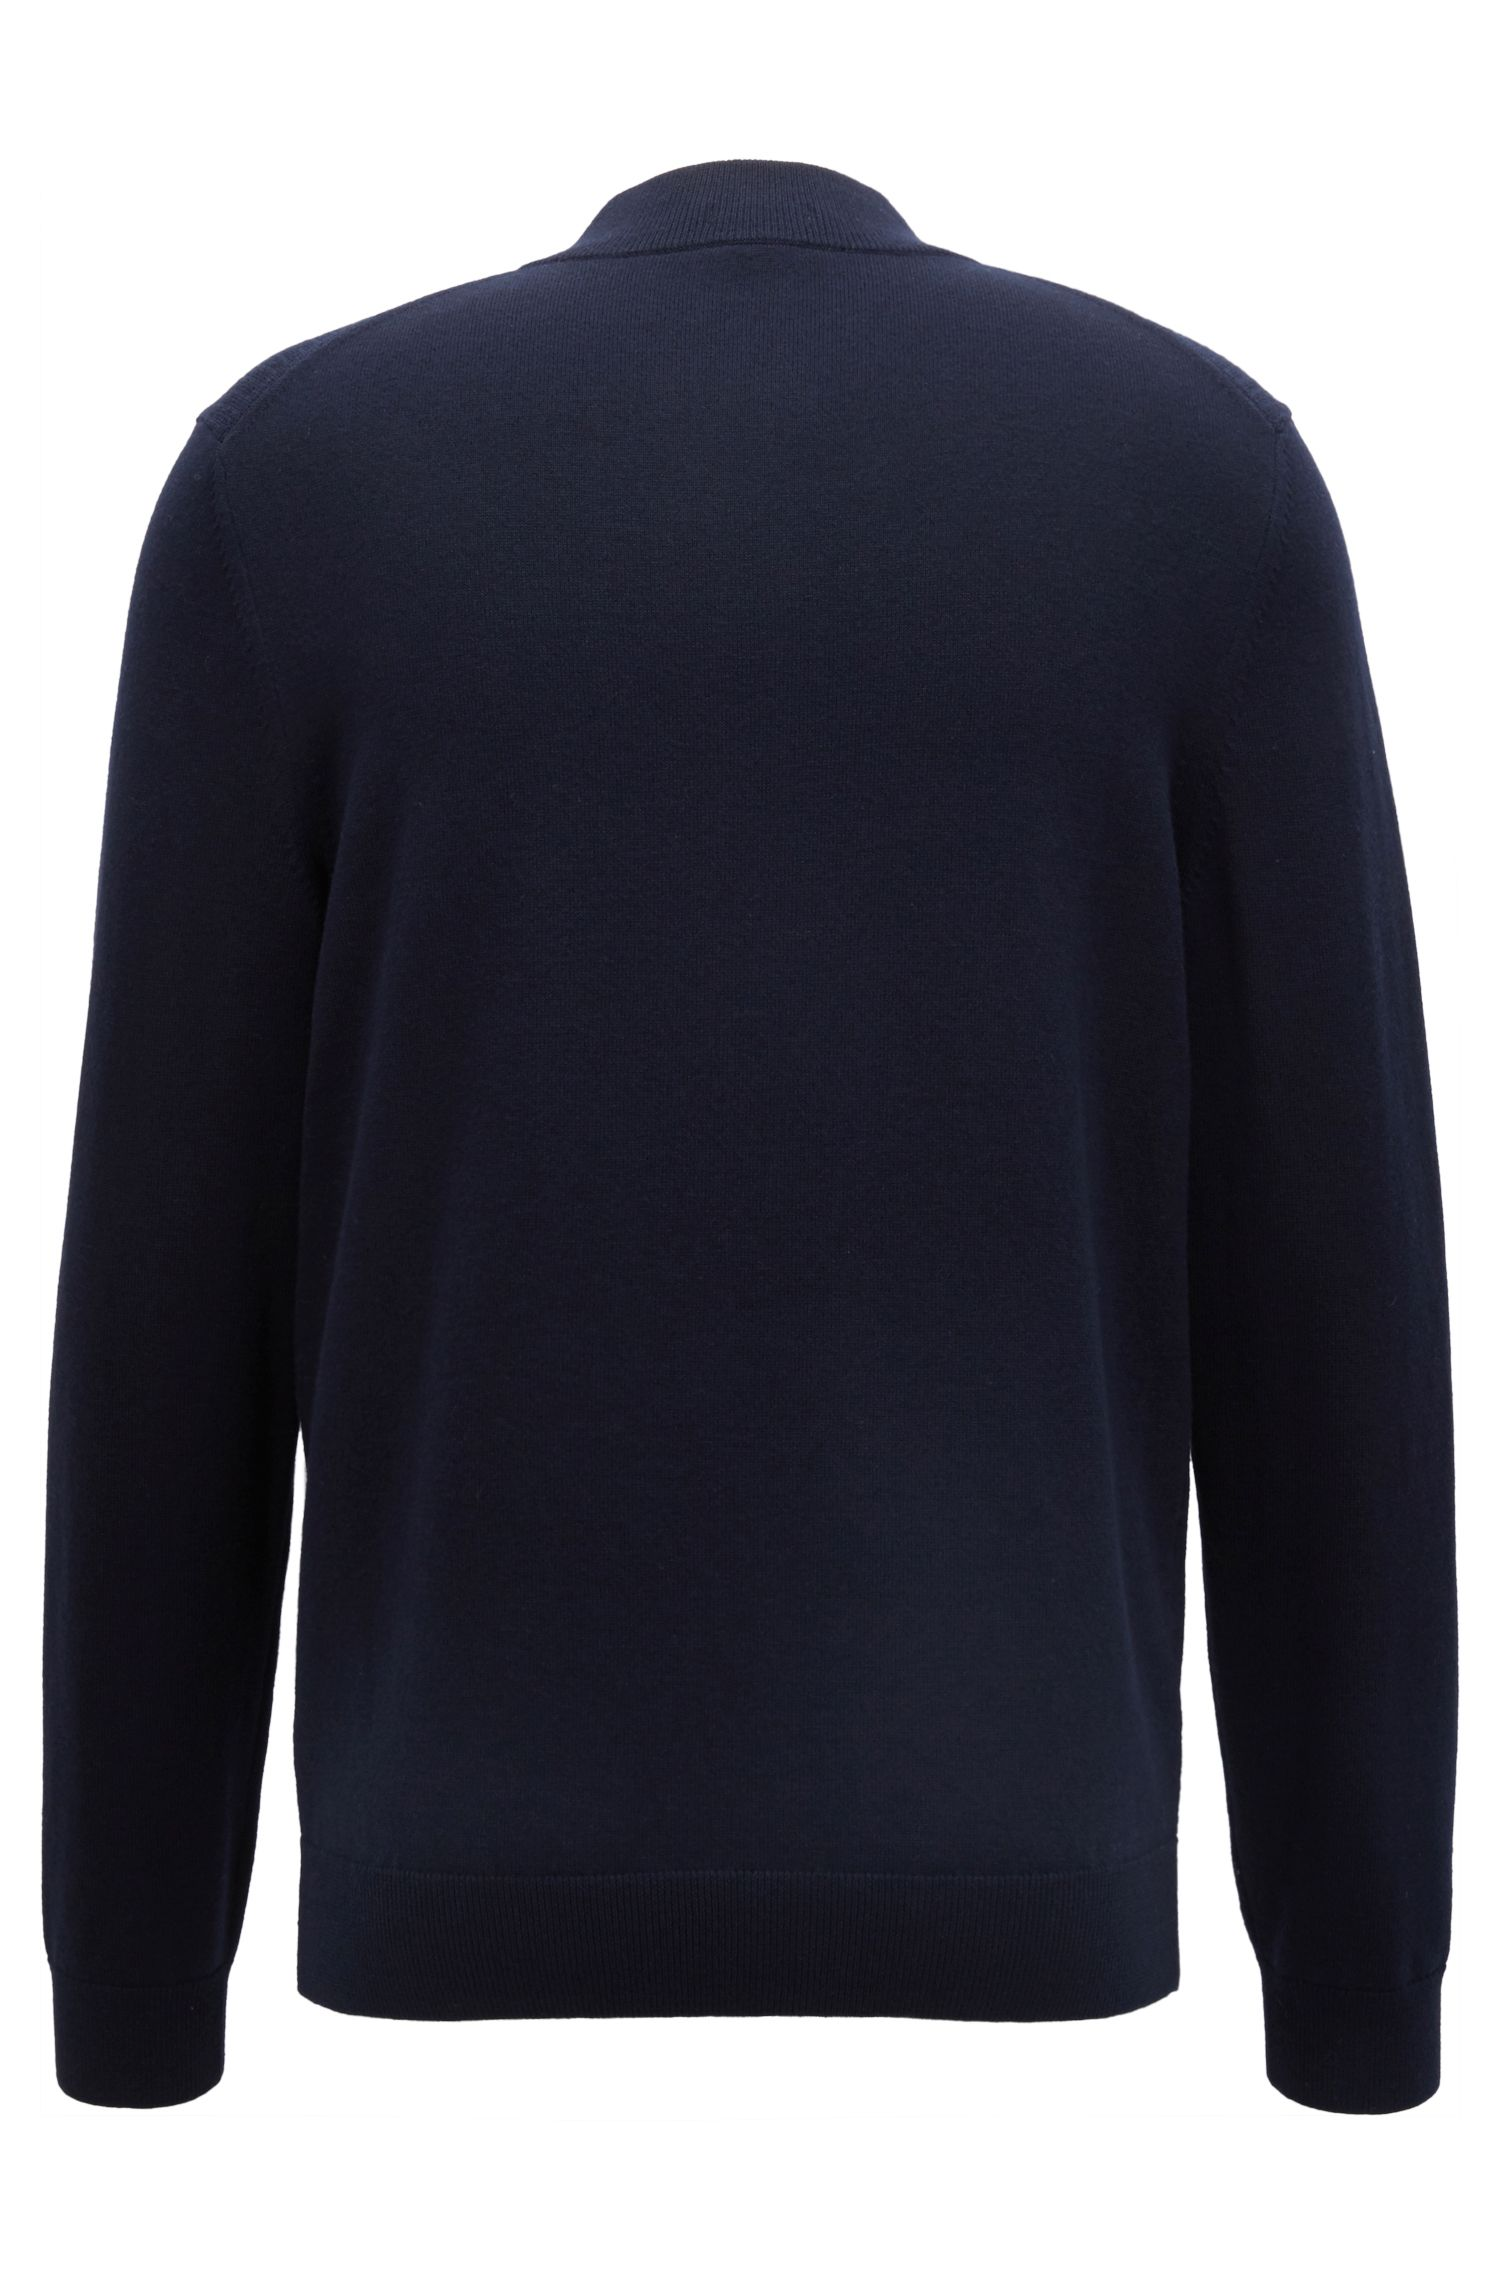 Zip-neck sweater in a wool-cotton blend, Blue